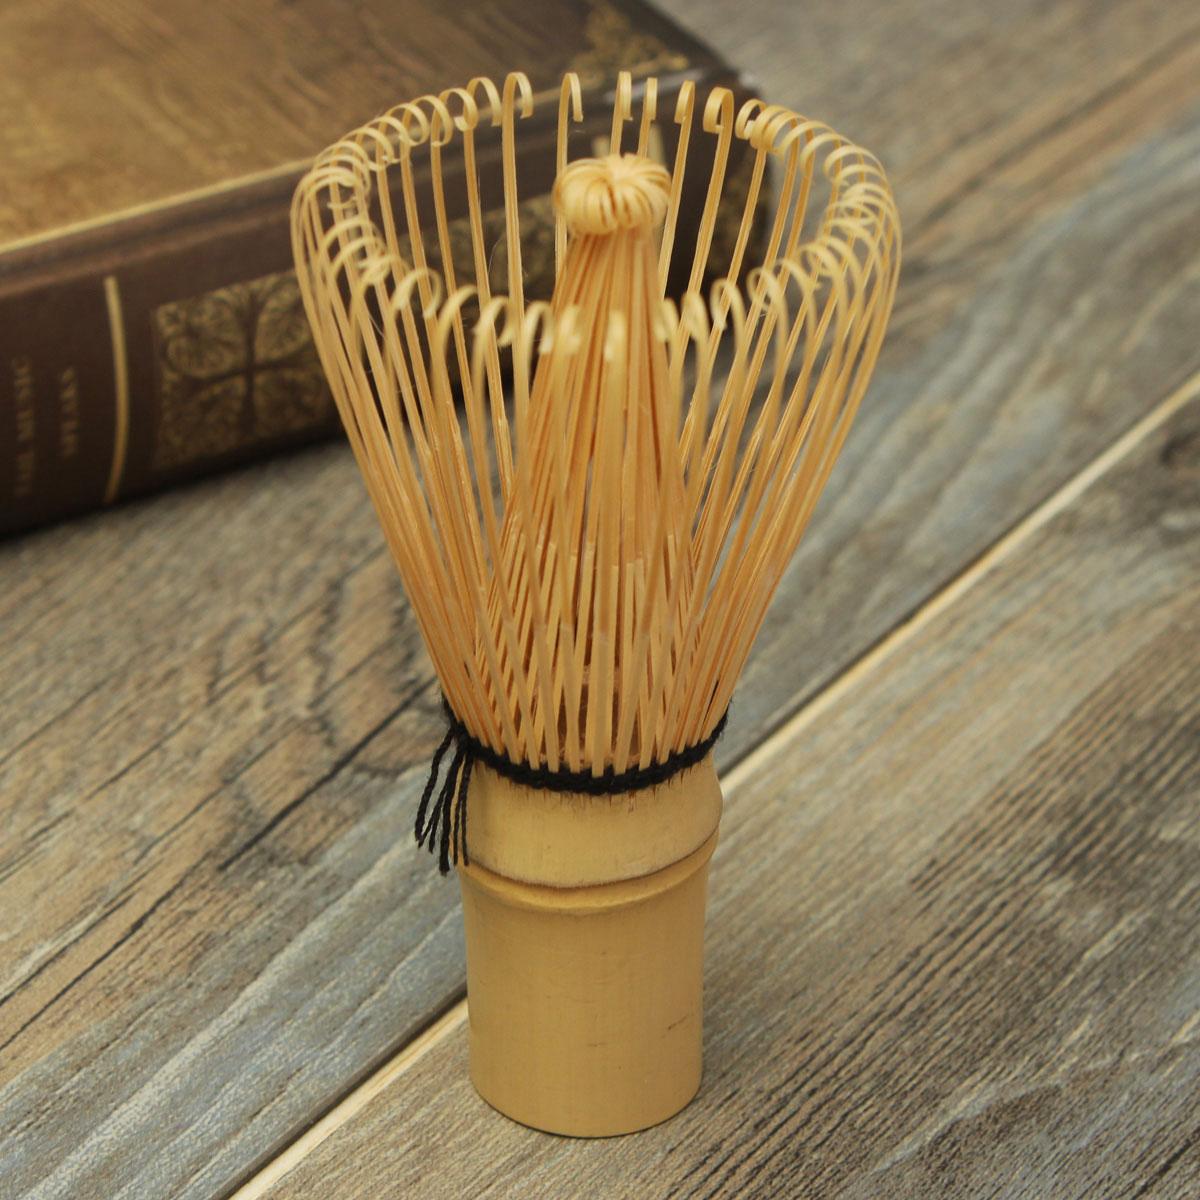 japan matcha besen chasen teebesen bambusbesen 64 borsten f r matcha schaum k1 ebay. Black Bedroom Furniture Sets. Home Design Ideas